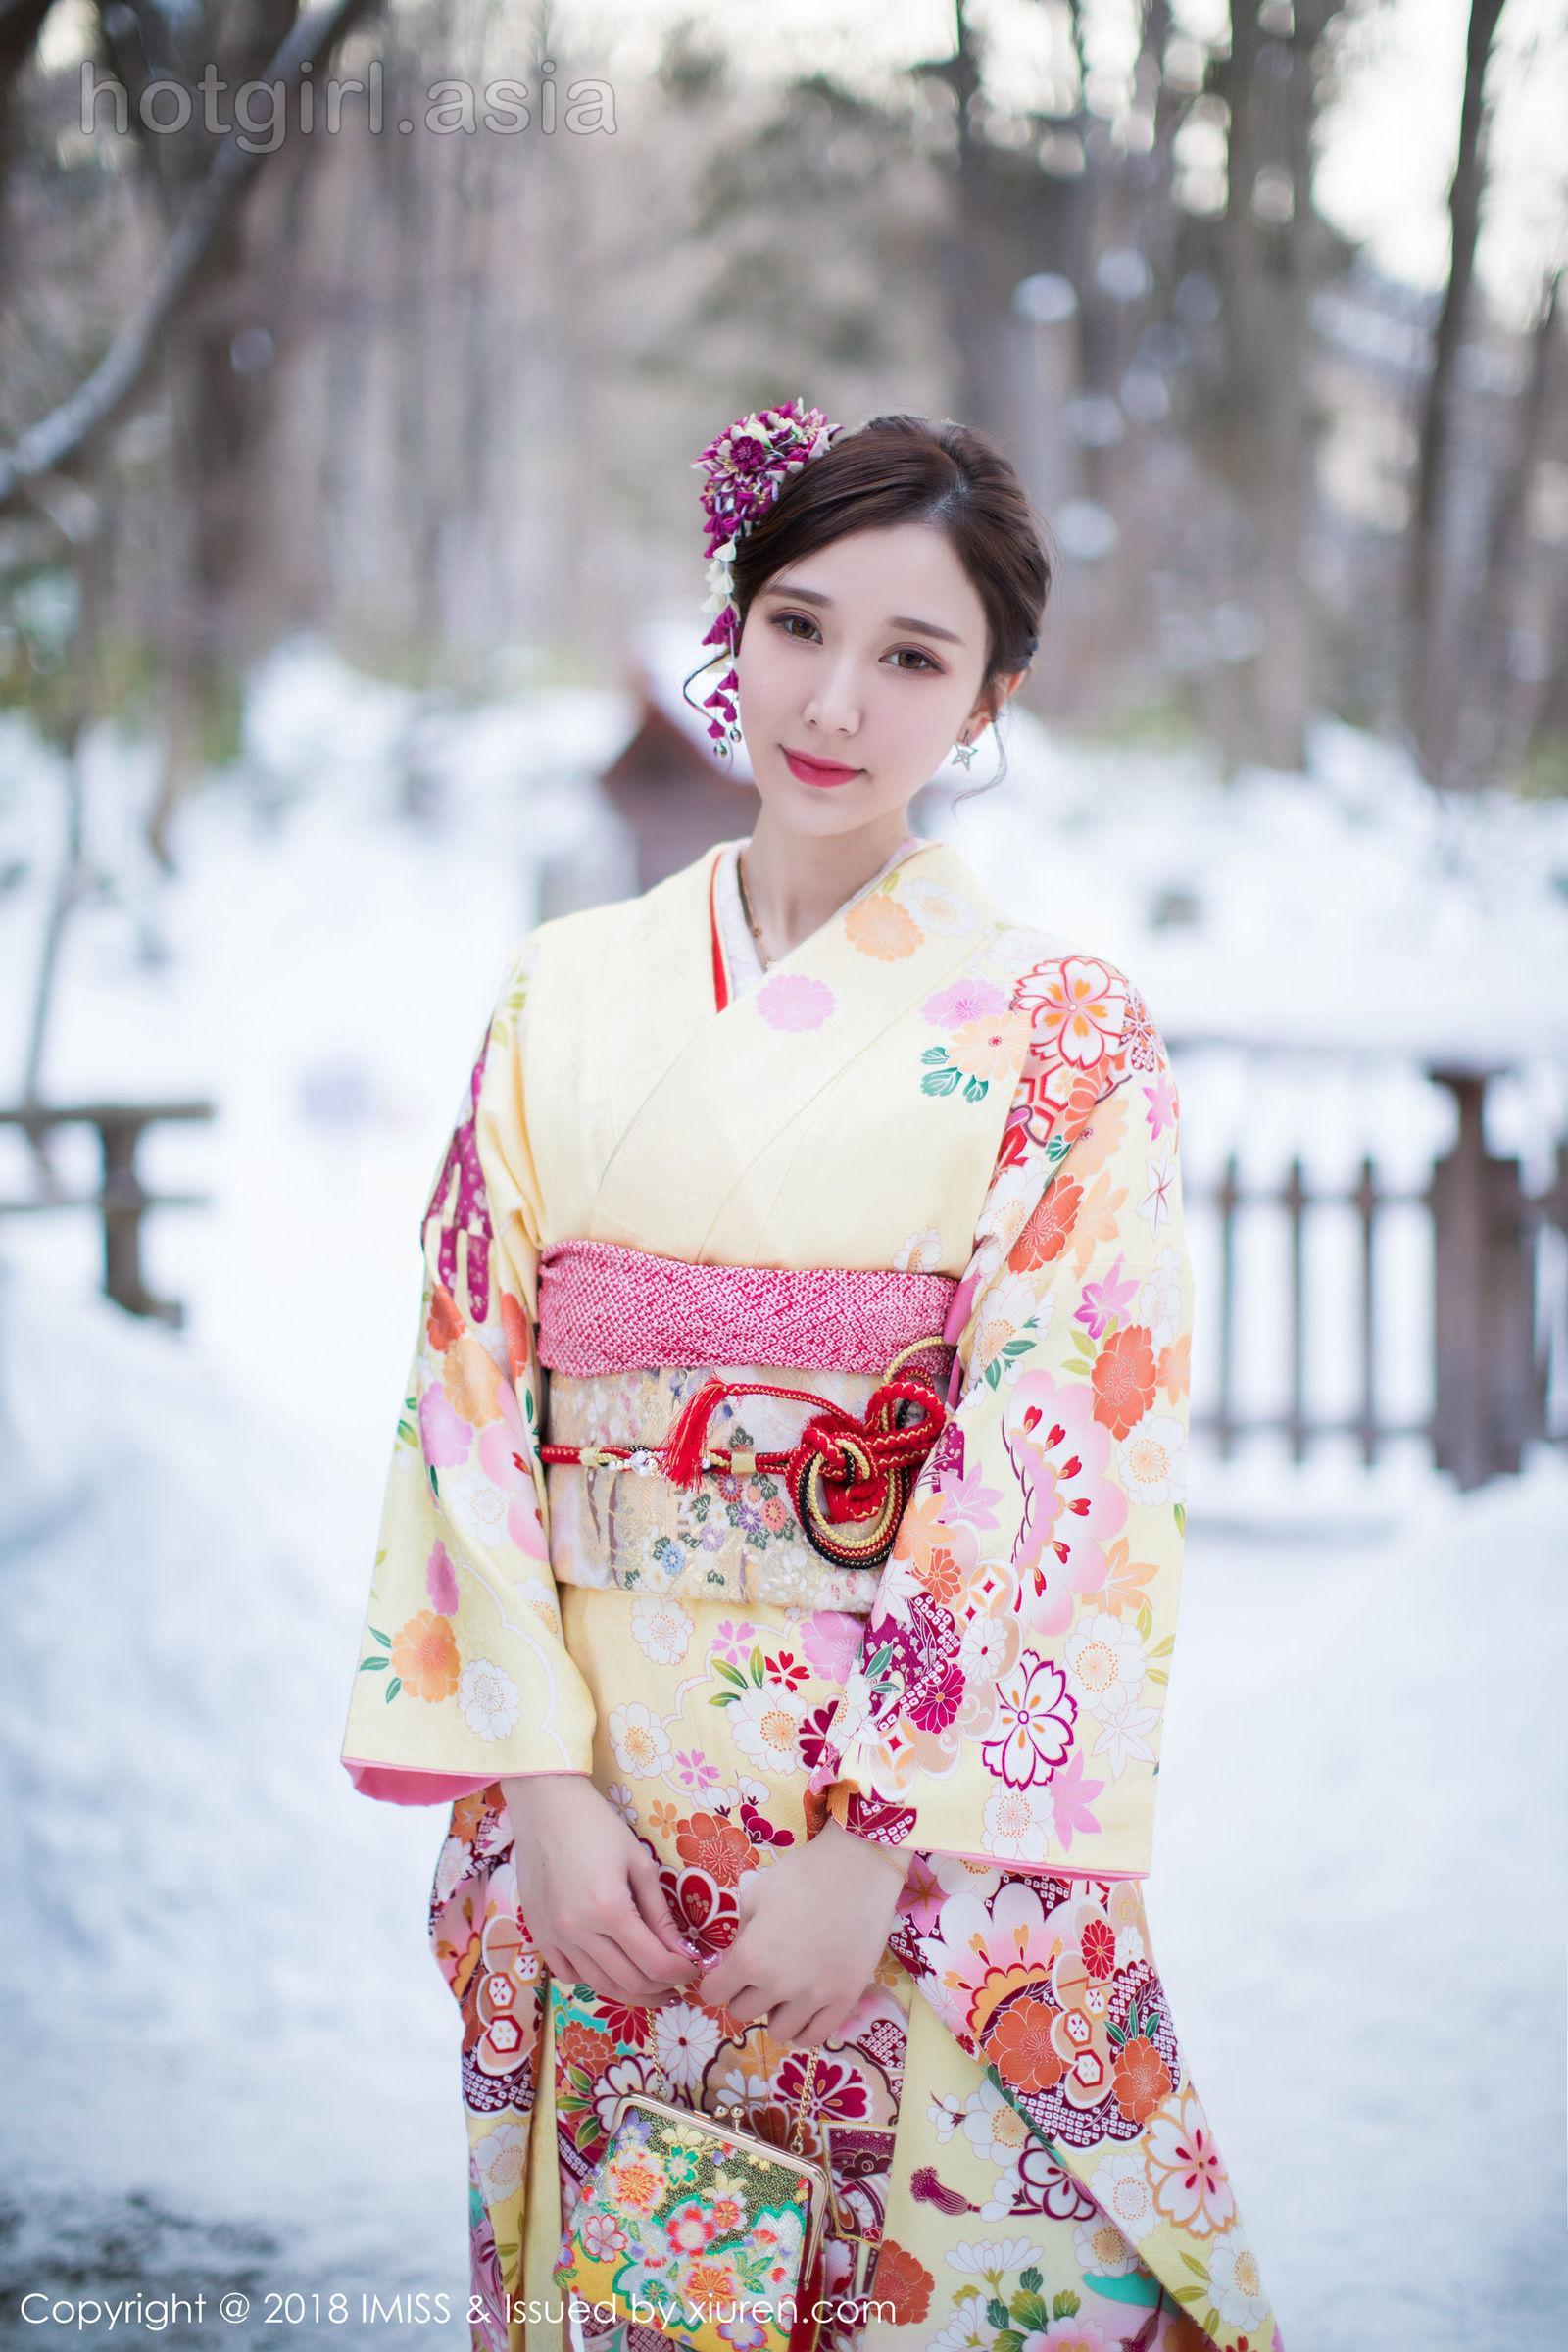 [IMiss 爱 蜜 社] Vol.242 养眼 美女 @ 淼淼 萌萌 哒 Hokkaido Travel Photo